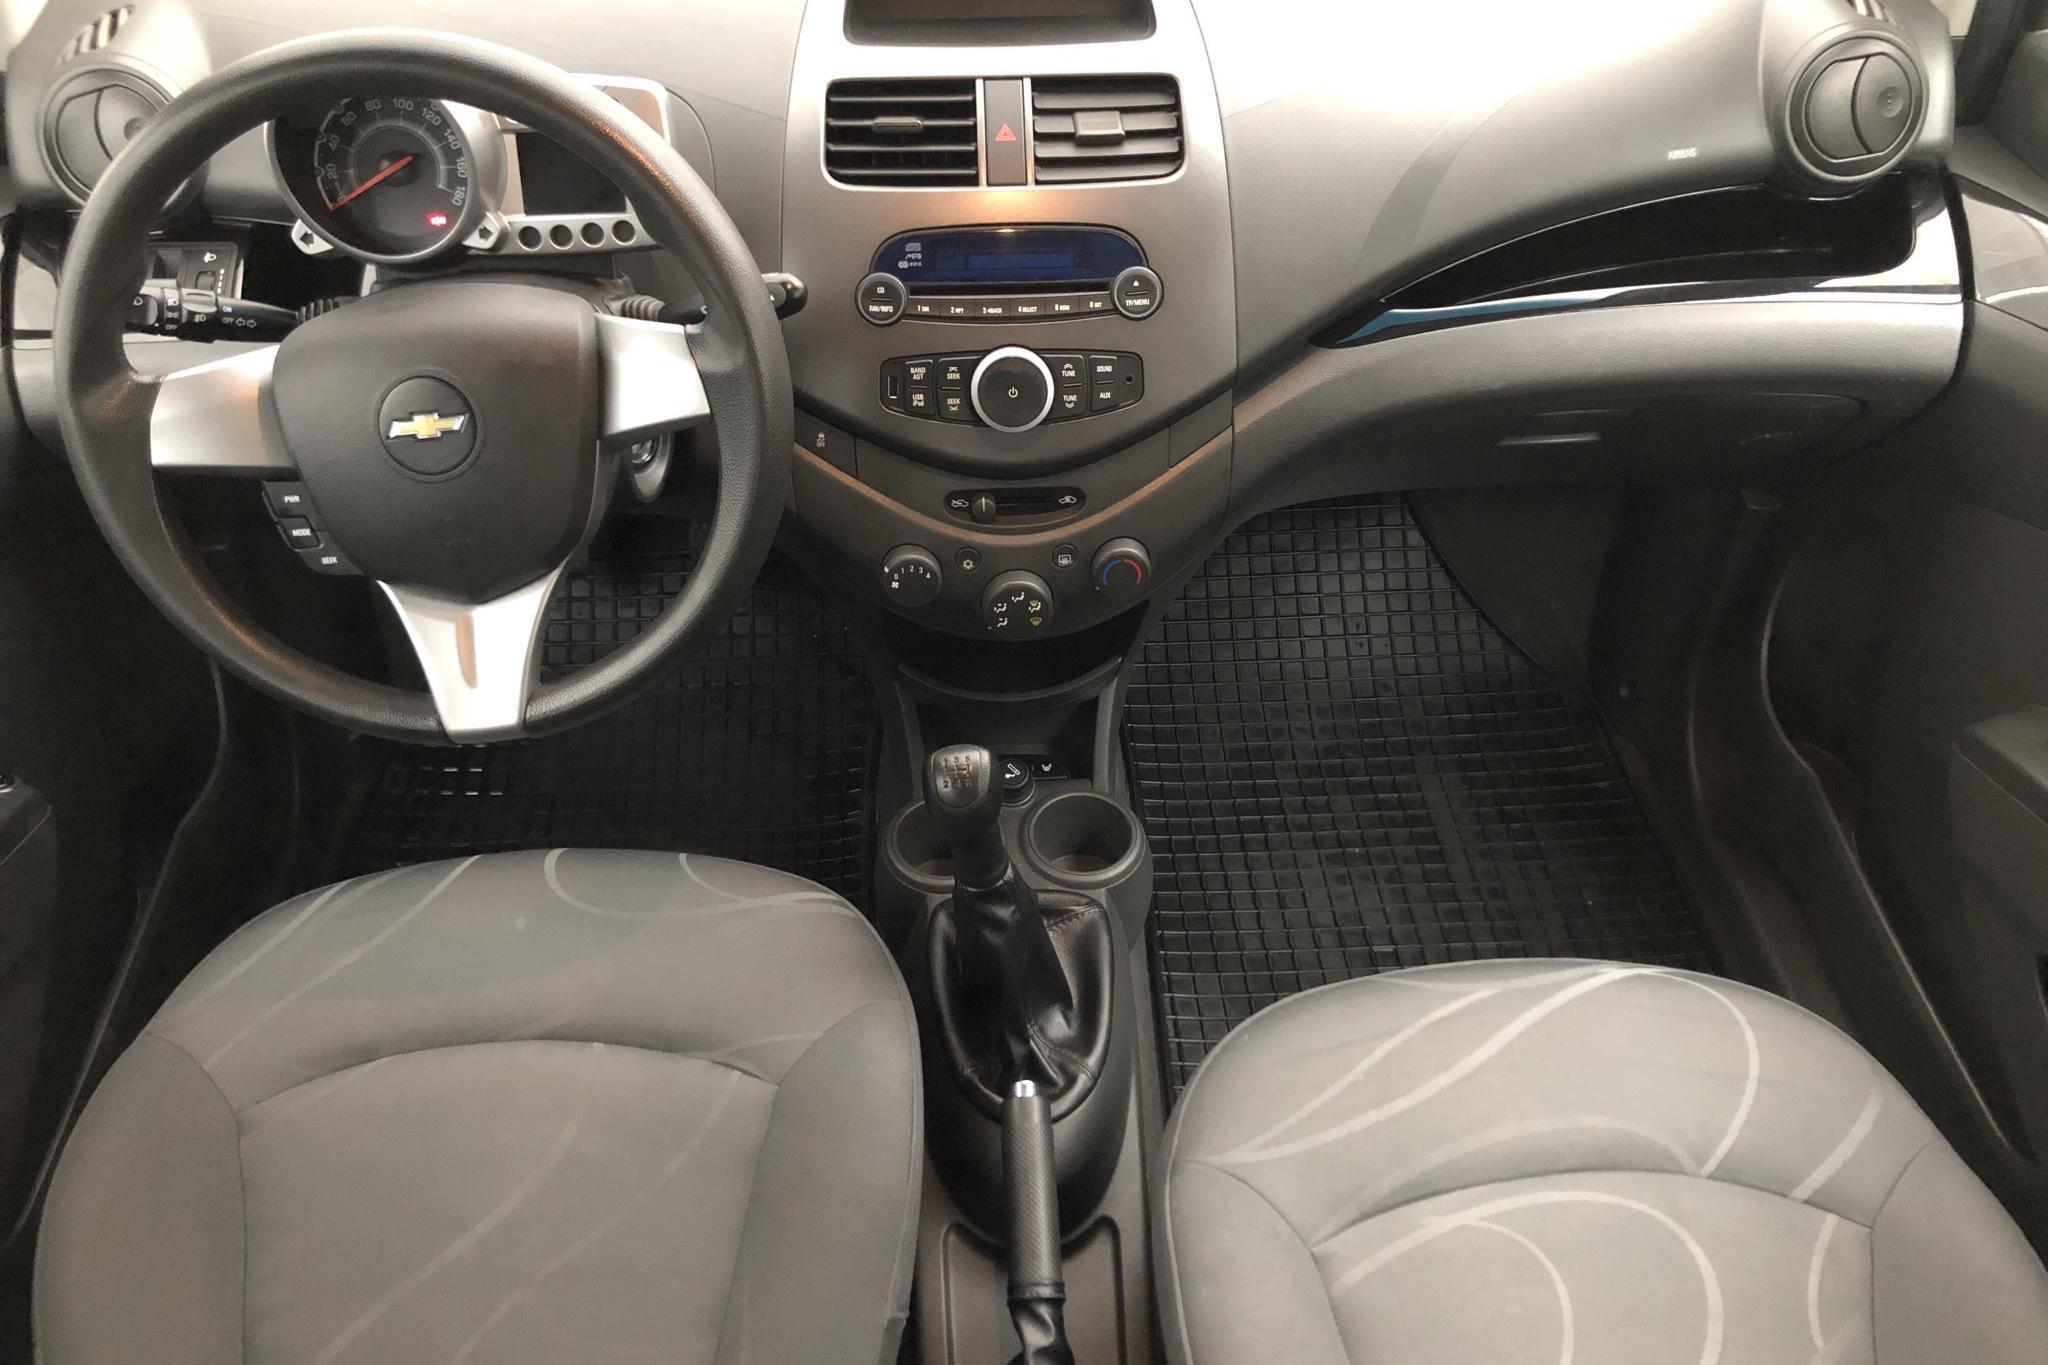 Chevrolet Spark 1.0 (63hk) - 7 907 mil - Manuell - grön - 2012